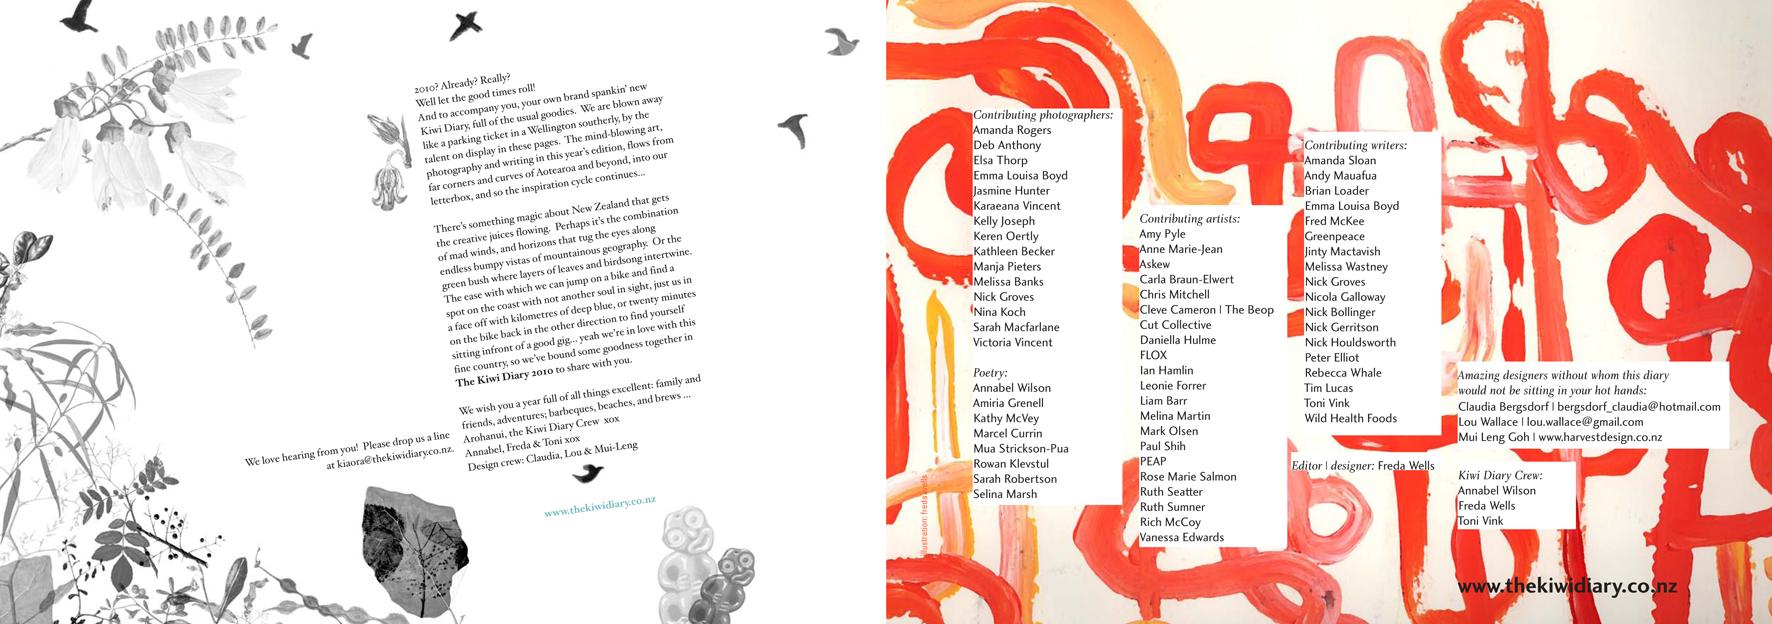 Kiwi Diary - spread